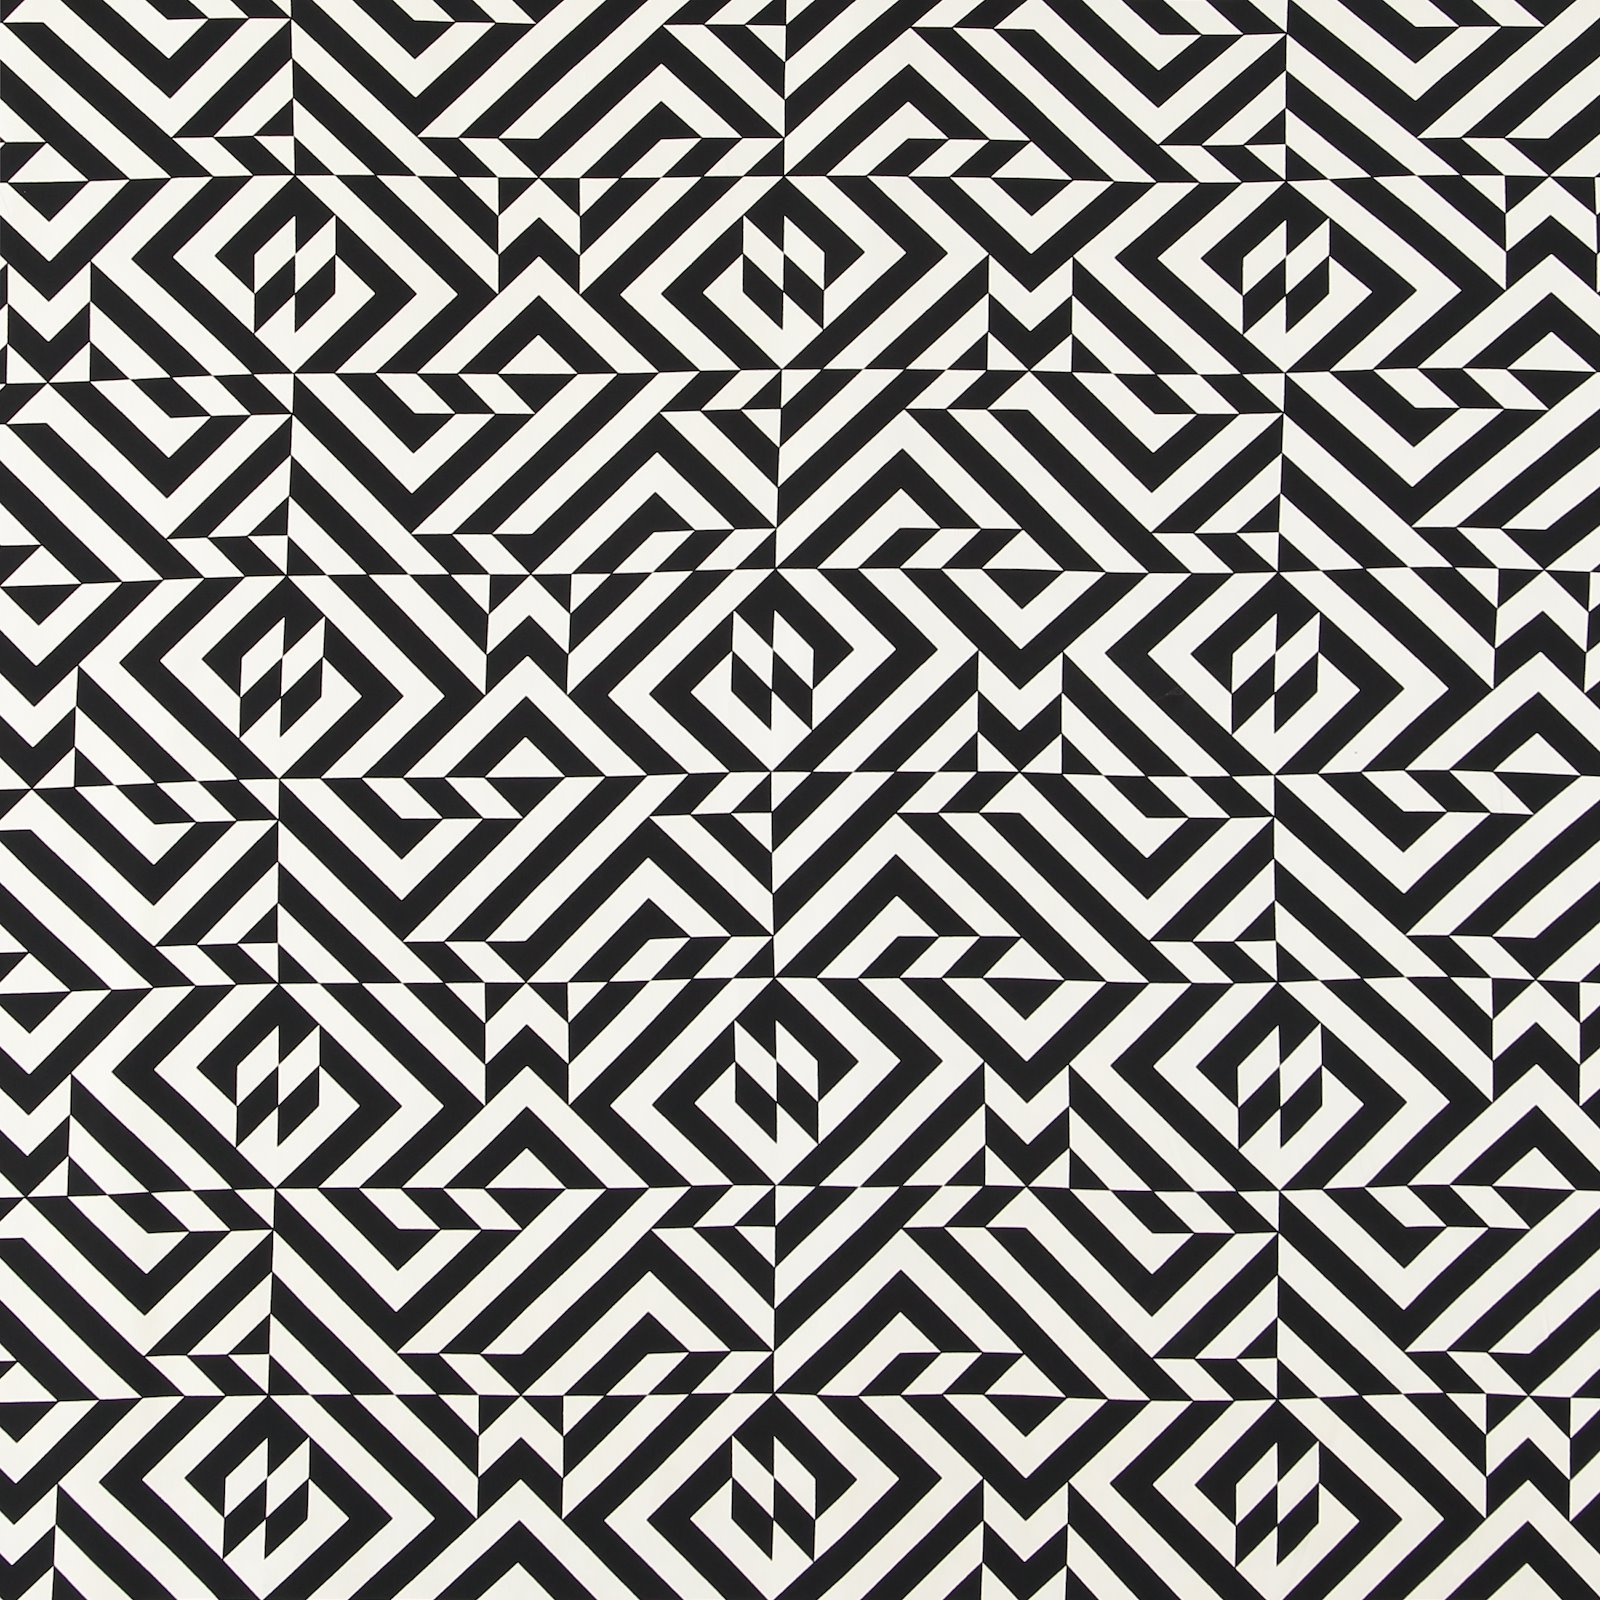 Chiffon black w. white graphic pattern 631249_pack_sp